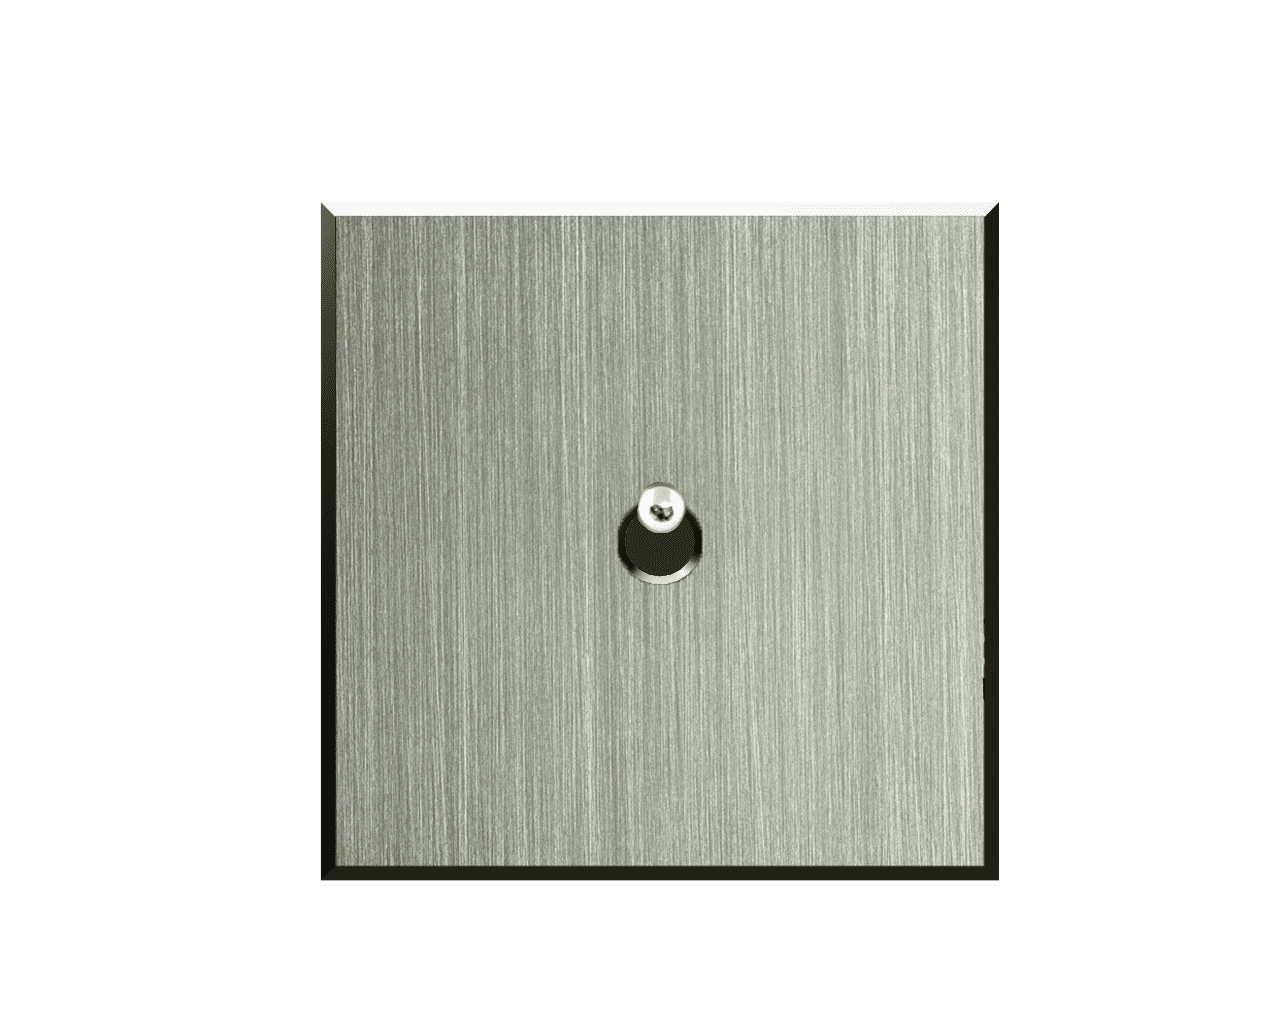 Interrupteur Matière Lumière finition Nickel Brossé